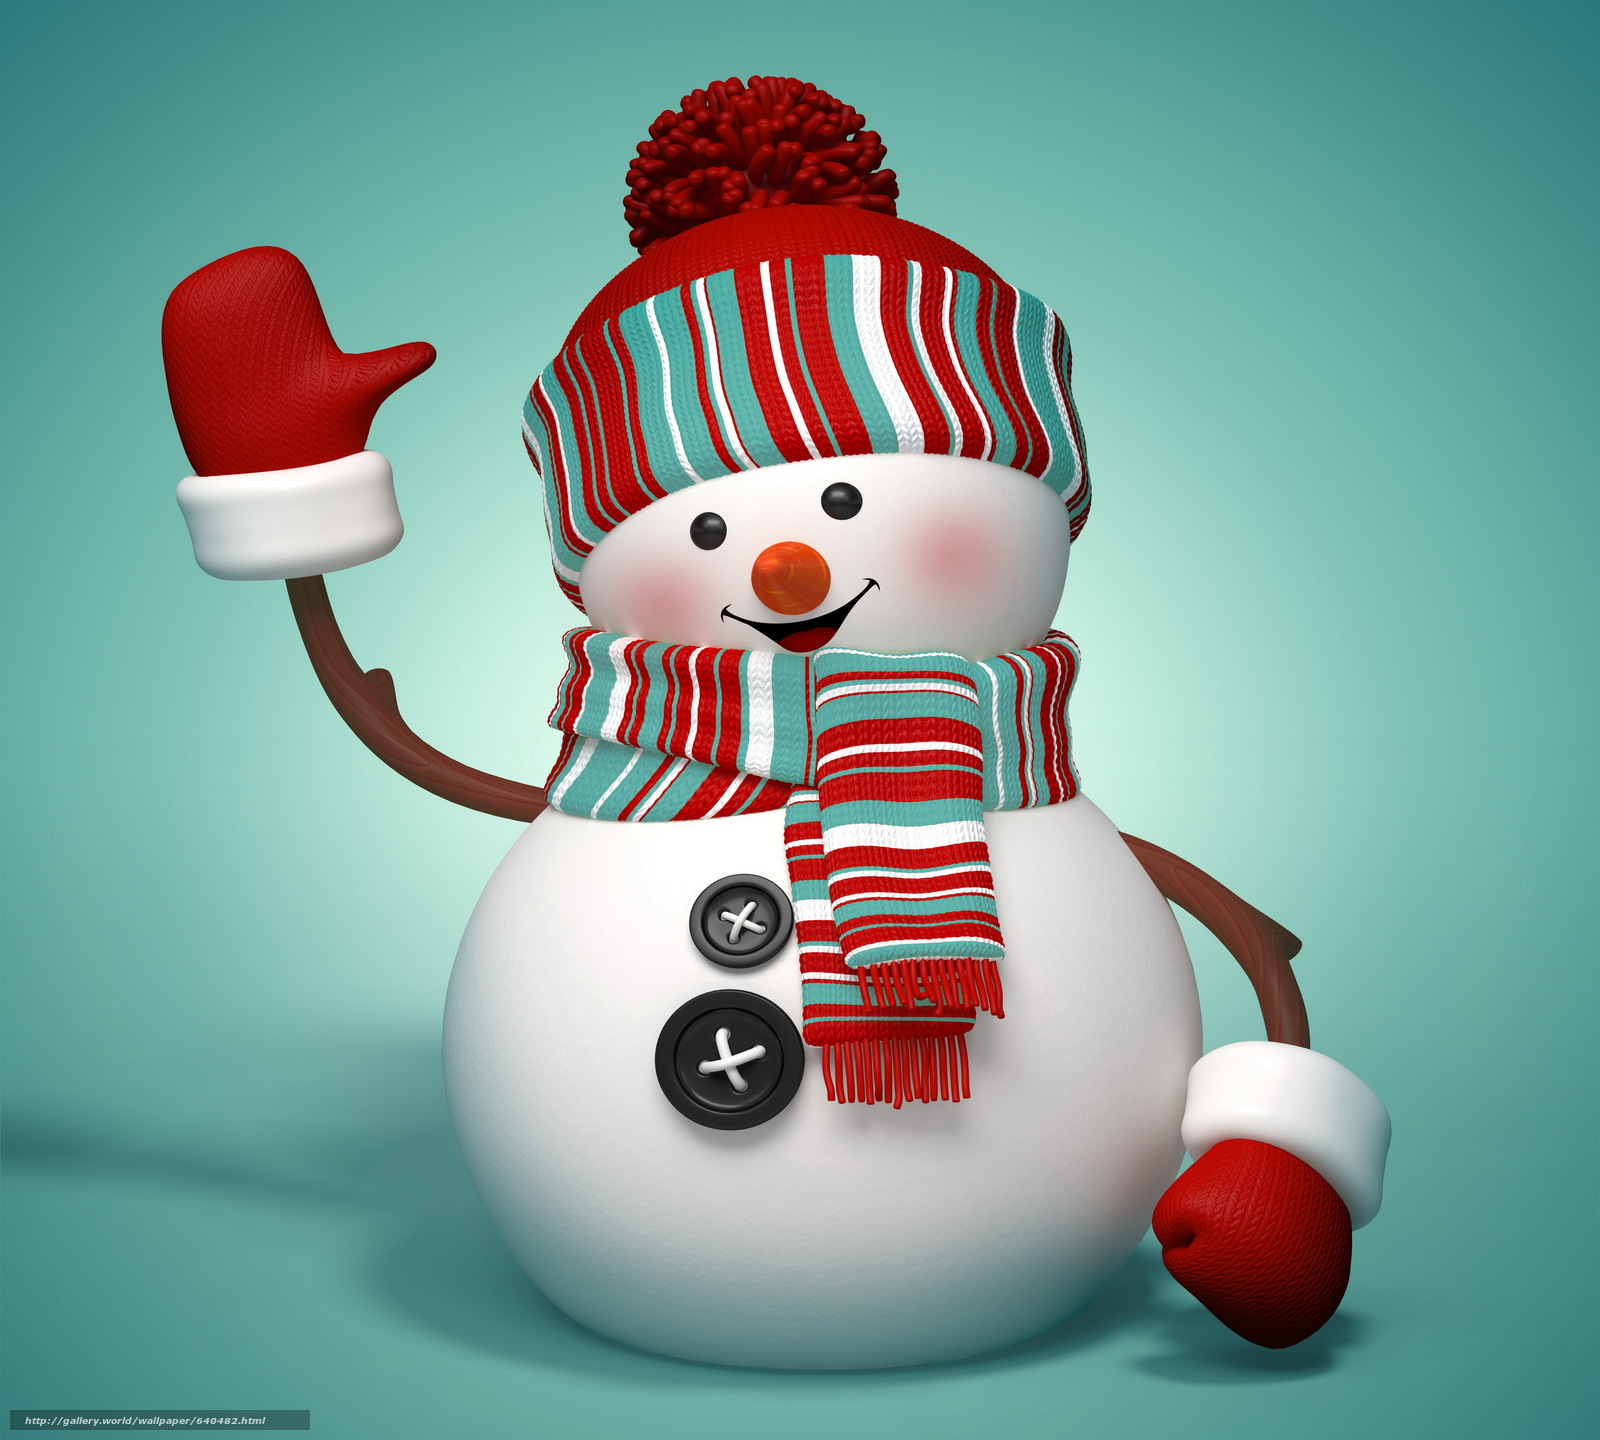 Download Wallpaper New Year, Holiday, Snowman, Snowmen